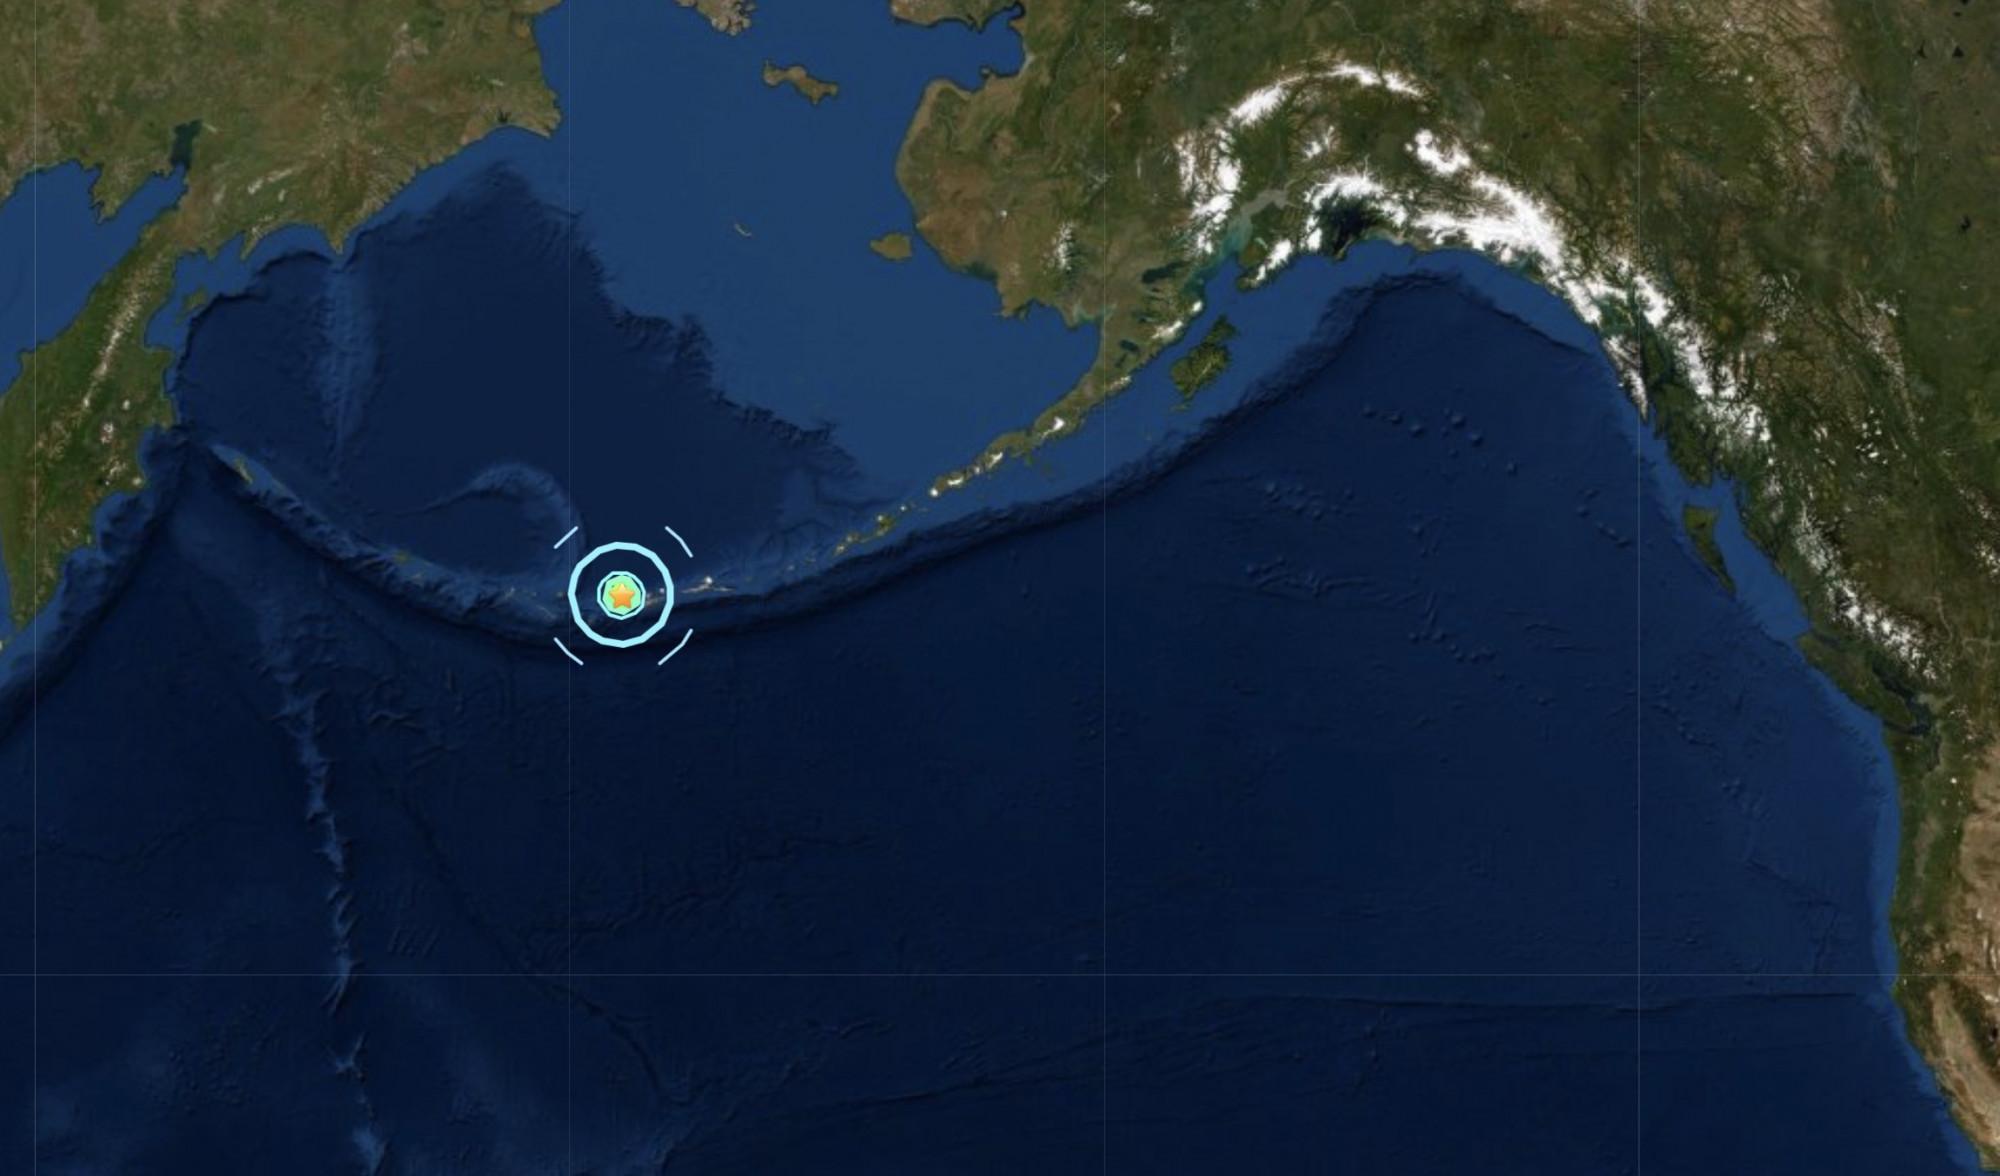 Major 6.2 Magnitude Earthquake Strikes Alaska: USGS